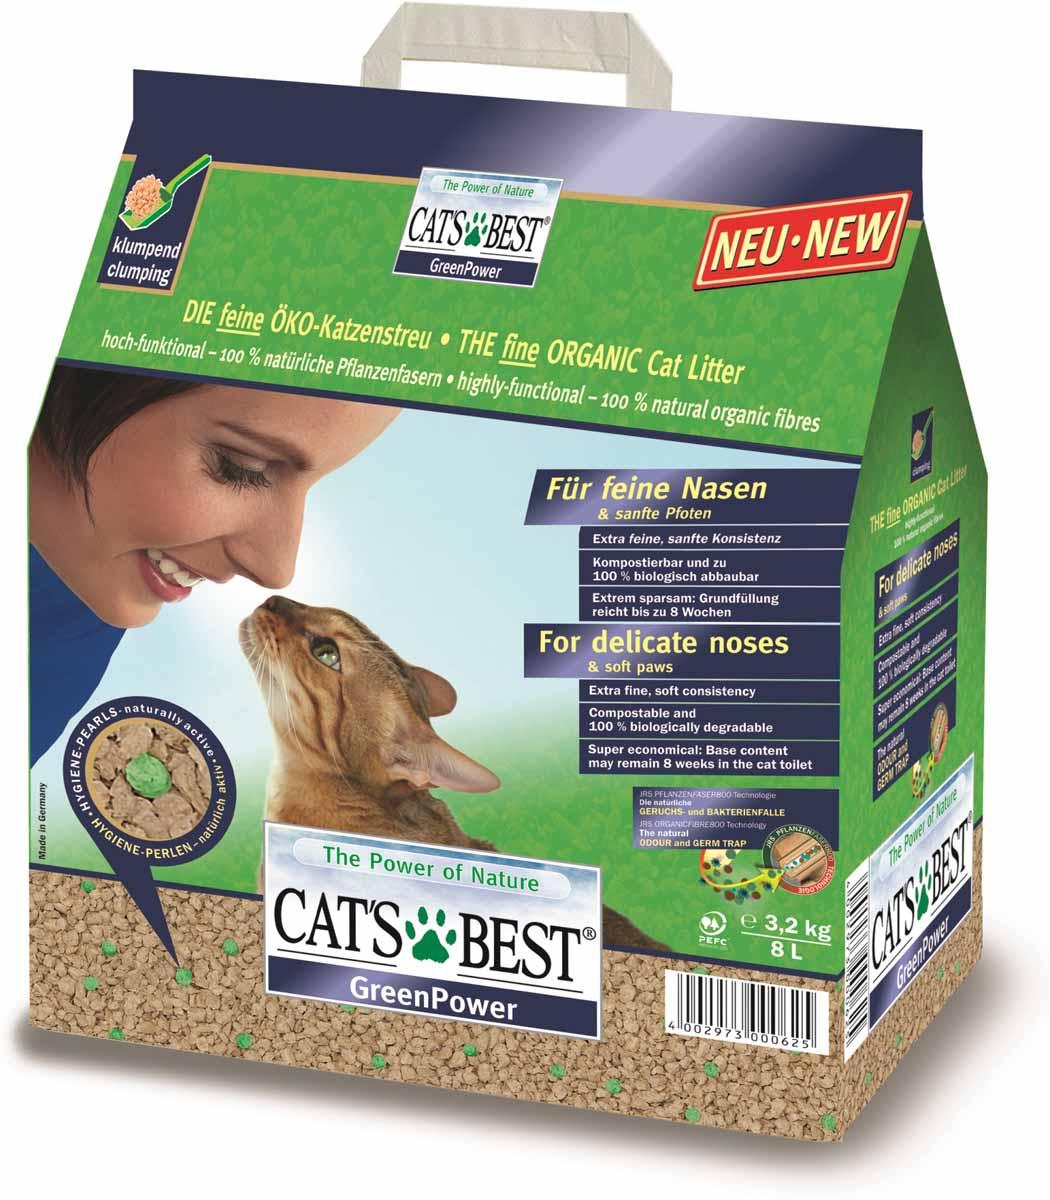 Cats Best Green Power Наполнитель древесный впитывающий 8л*3,2кг101246Древесный комкующийся наполнитель